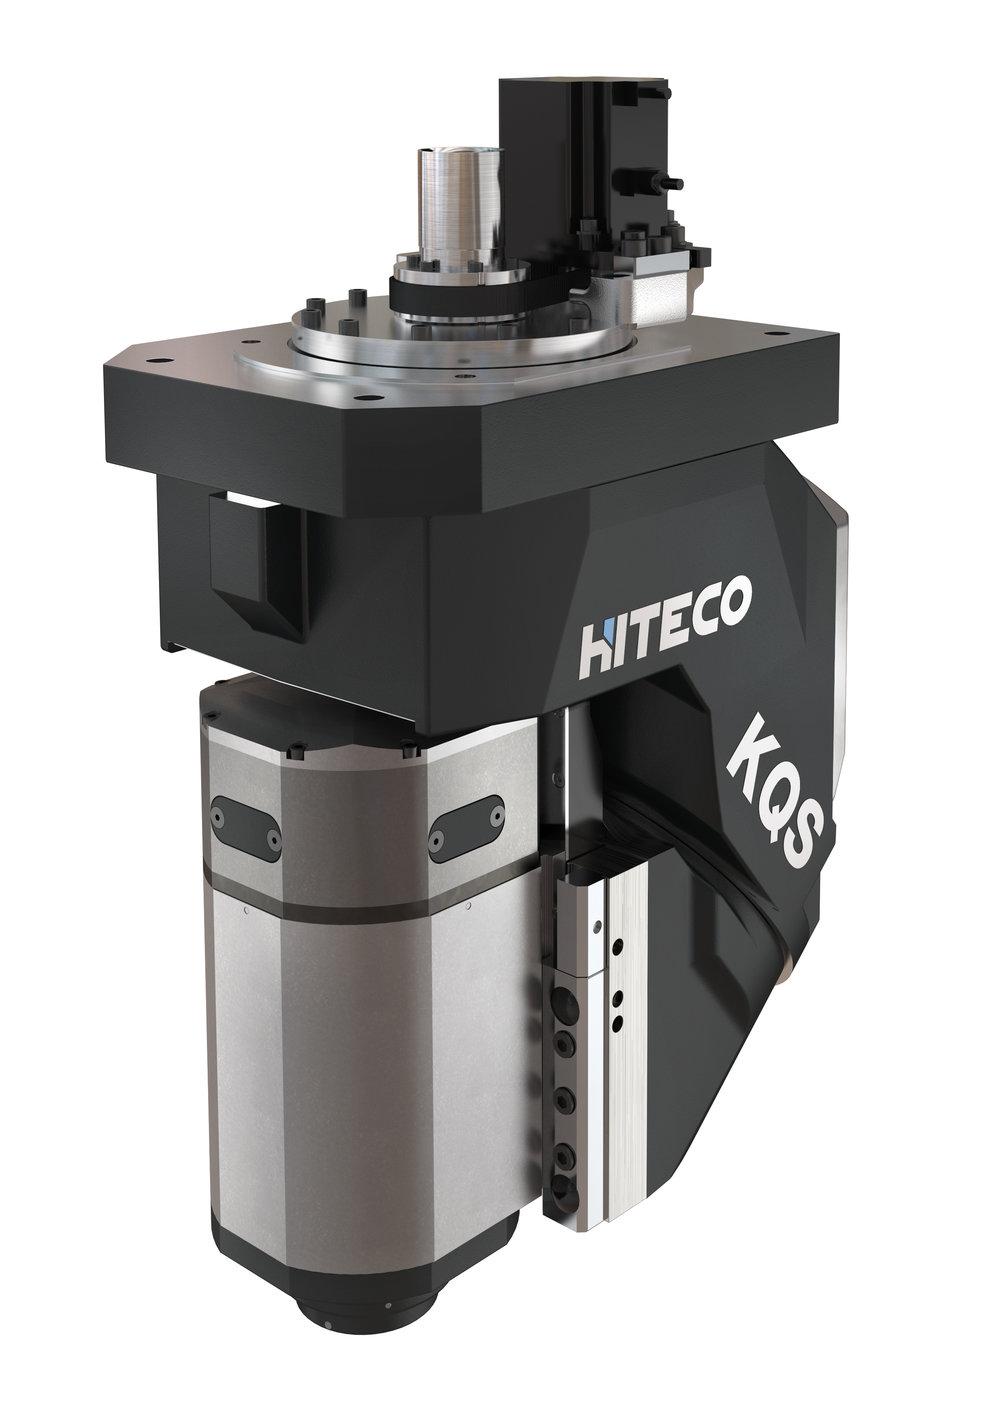 Hiteco Spindle Mec Precision Repair Servo Motor Spindles Valve Service Orbital K Series 50